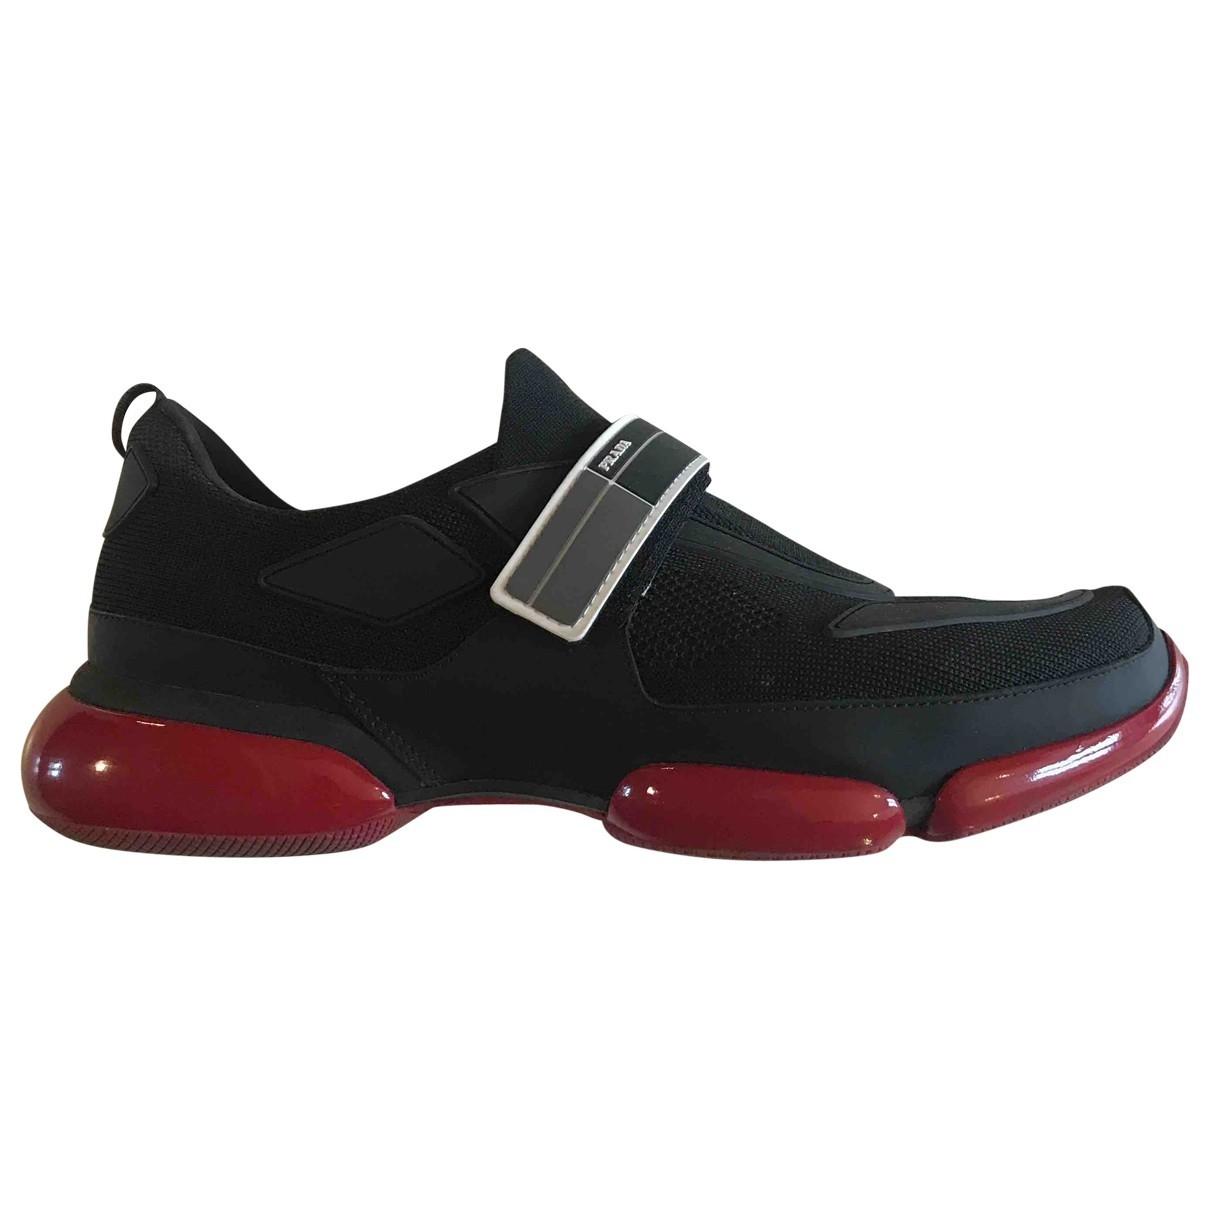 Prada Cloudbust Black Cloth Trainers for Men 8.5 UK